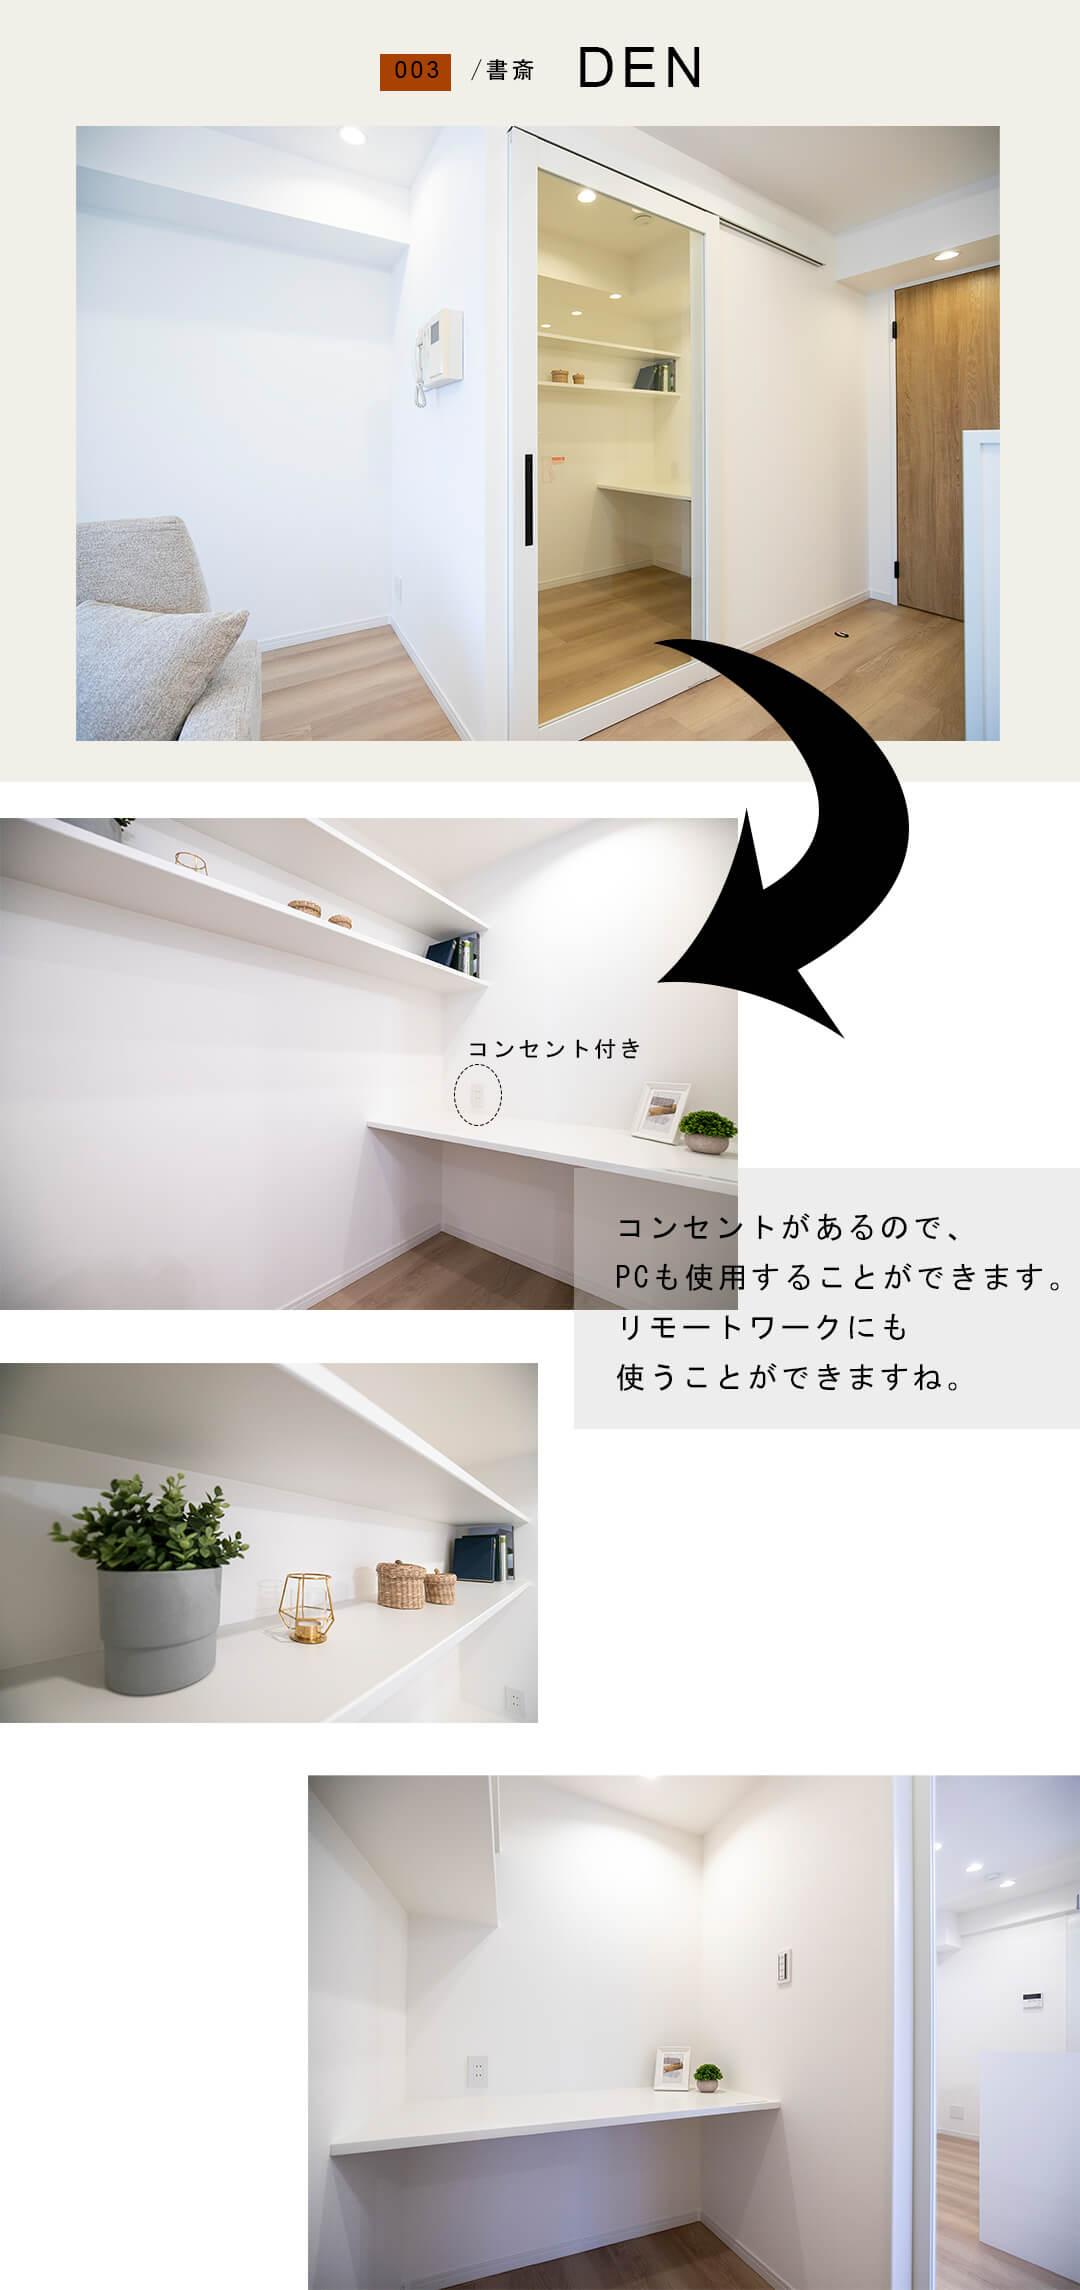 003書斎,DEN